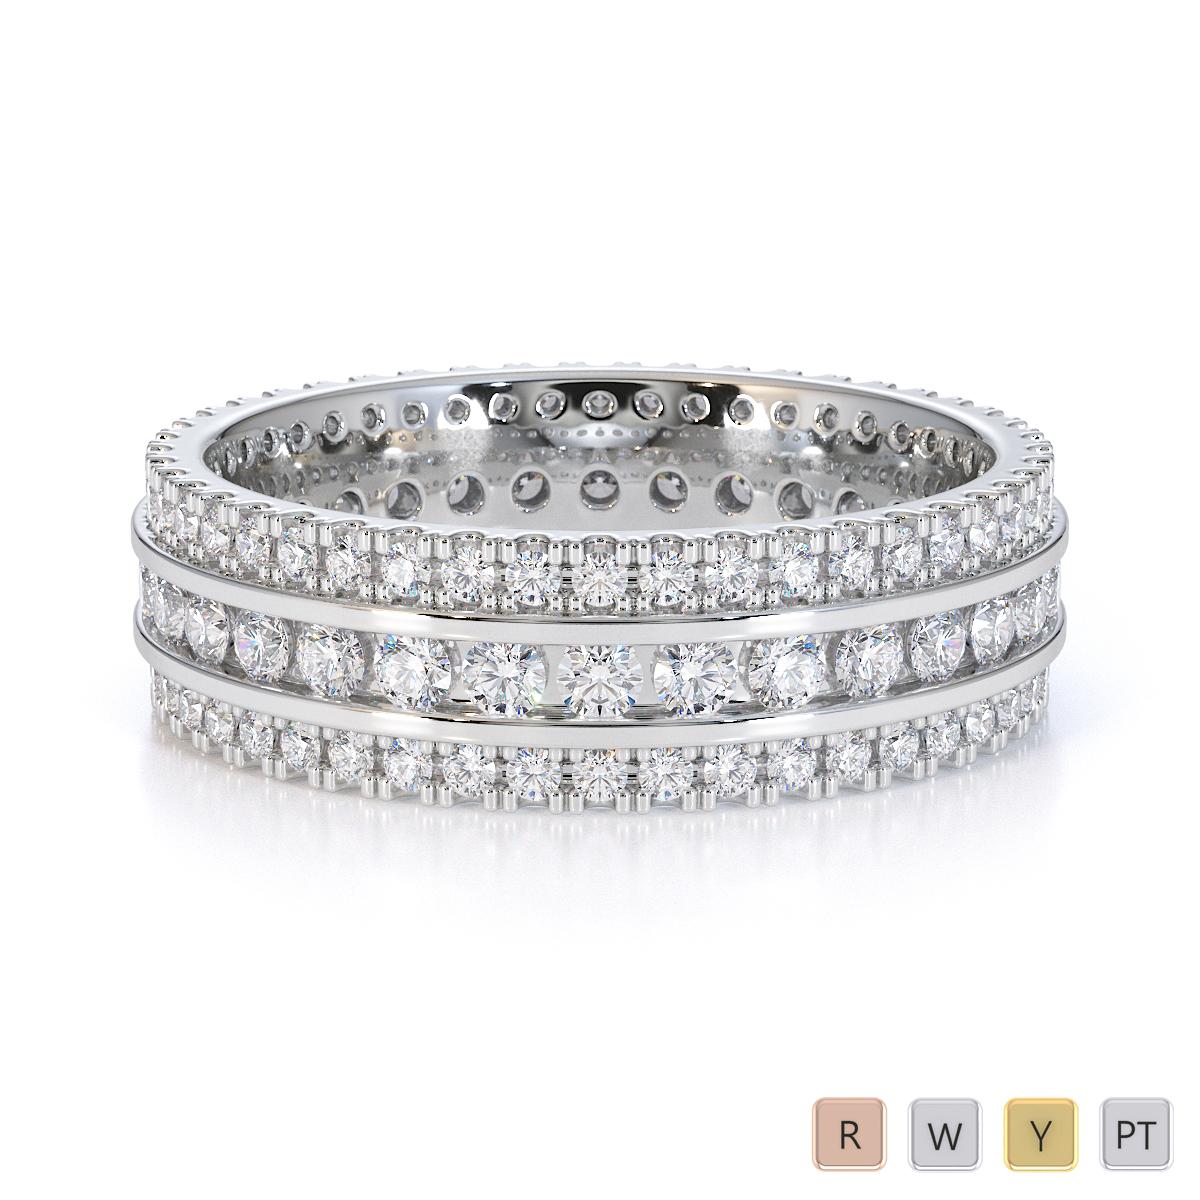 Gold / Platinum Diamond Full Eternity Ring RZ1526